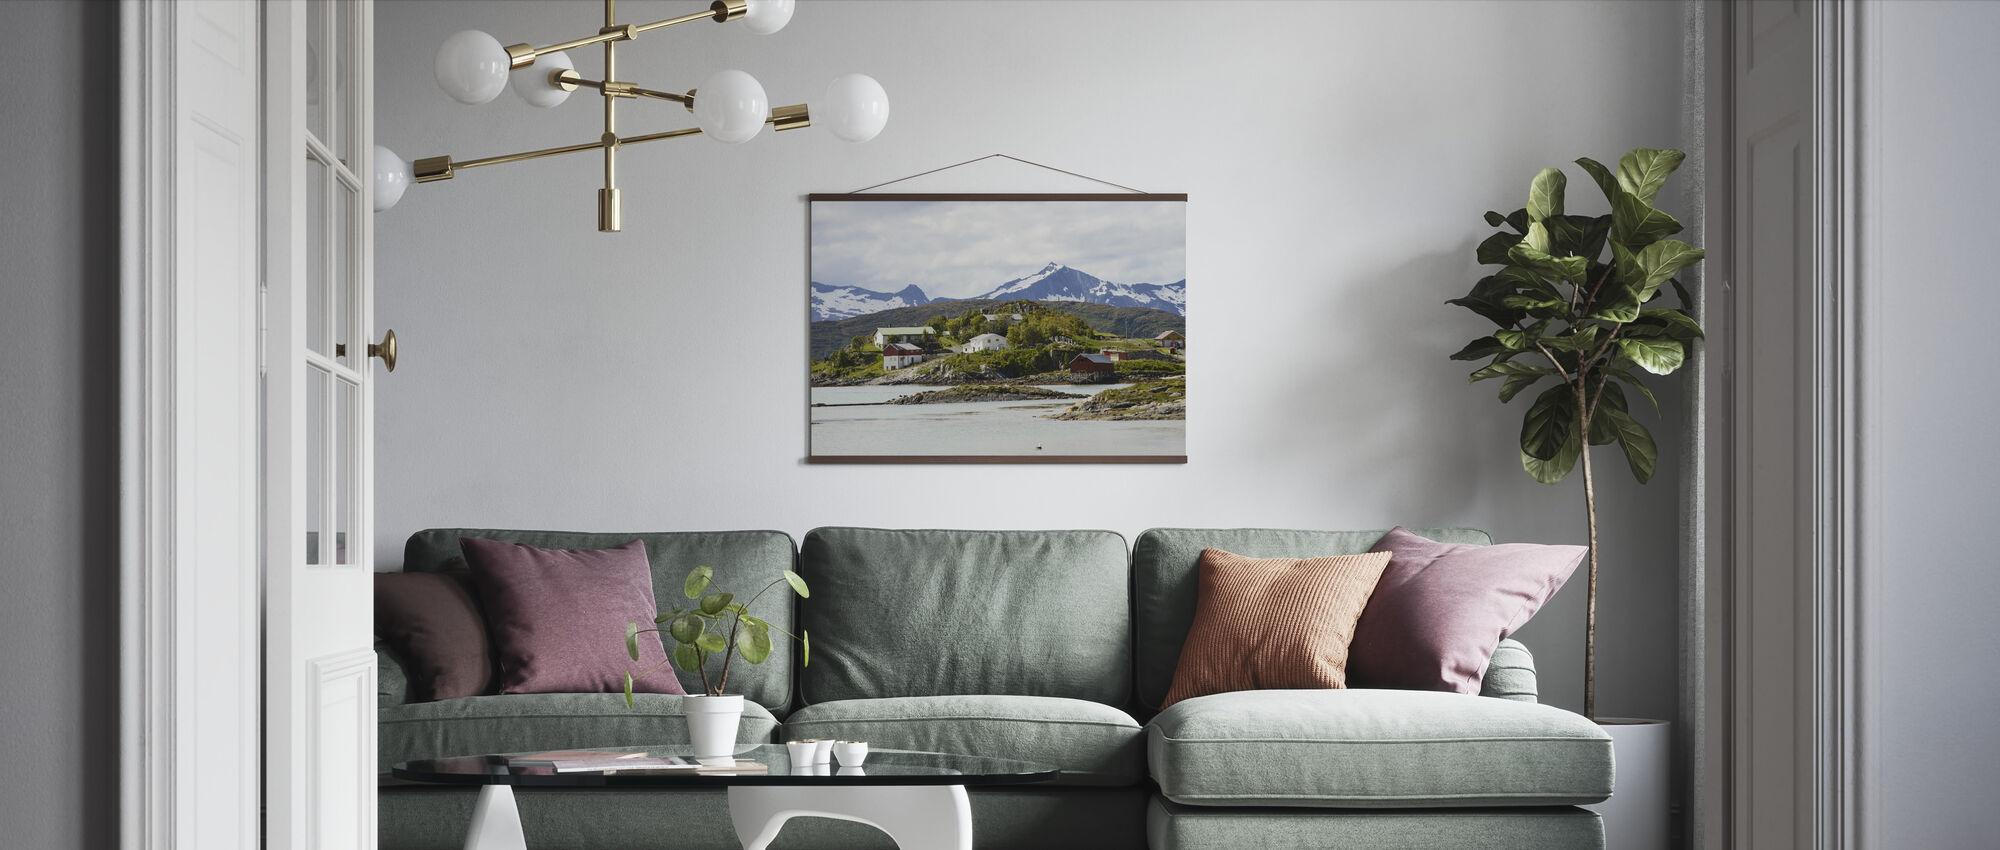 Fiske by - Poster - Vardagsrum